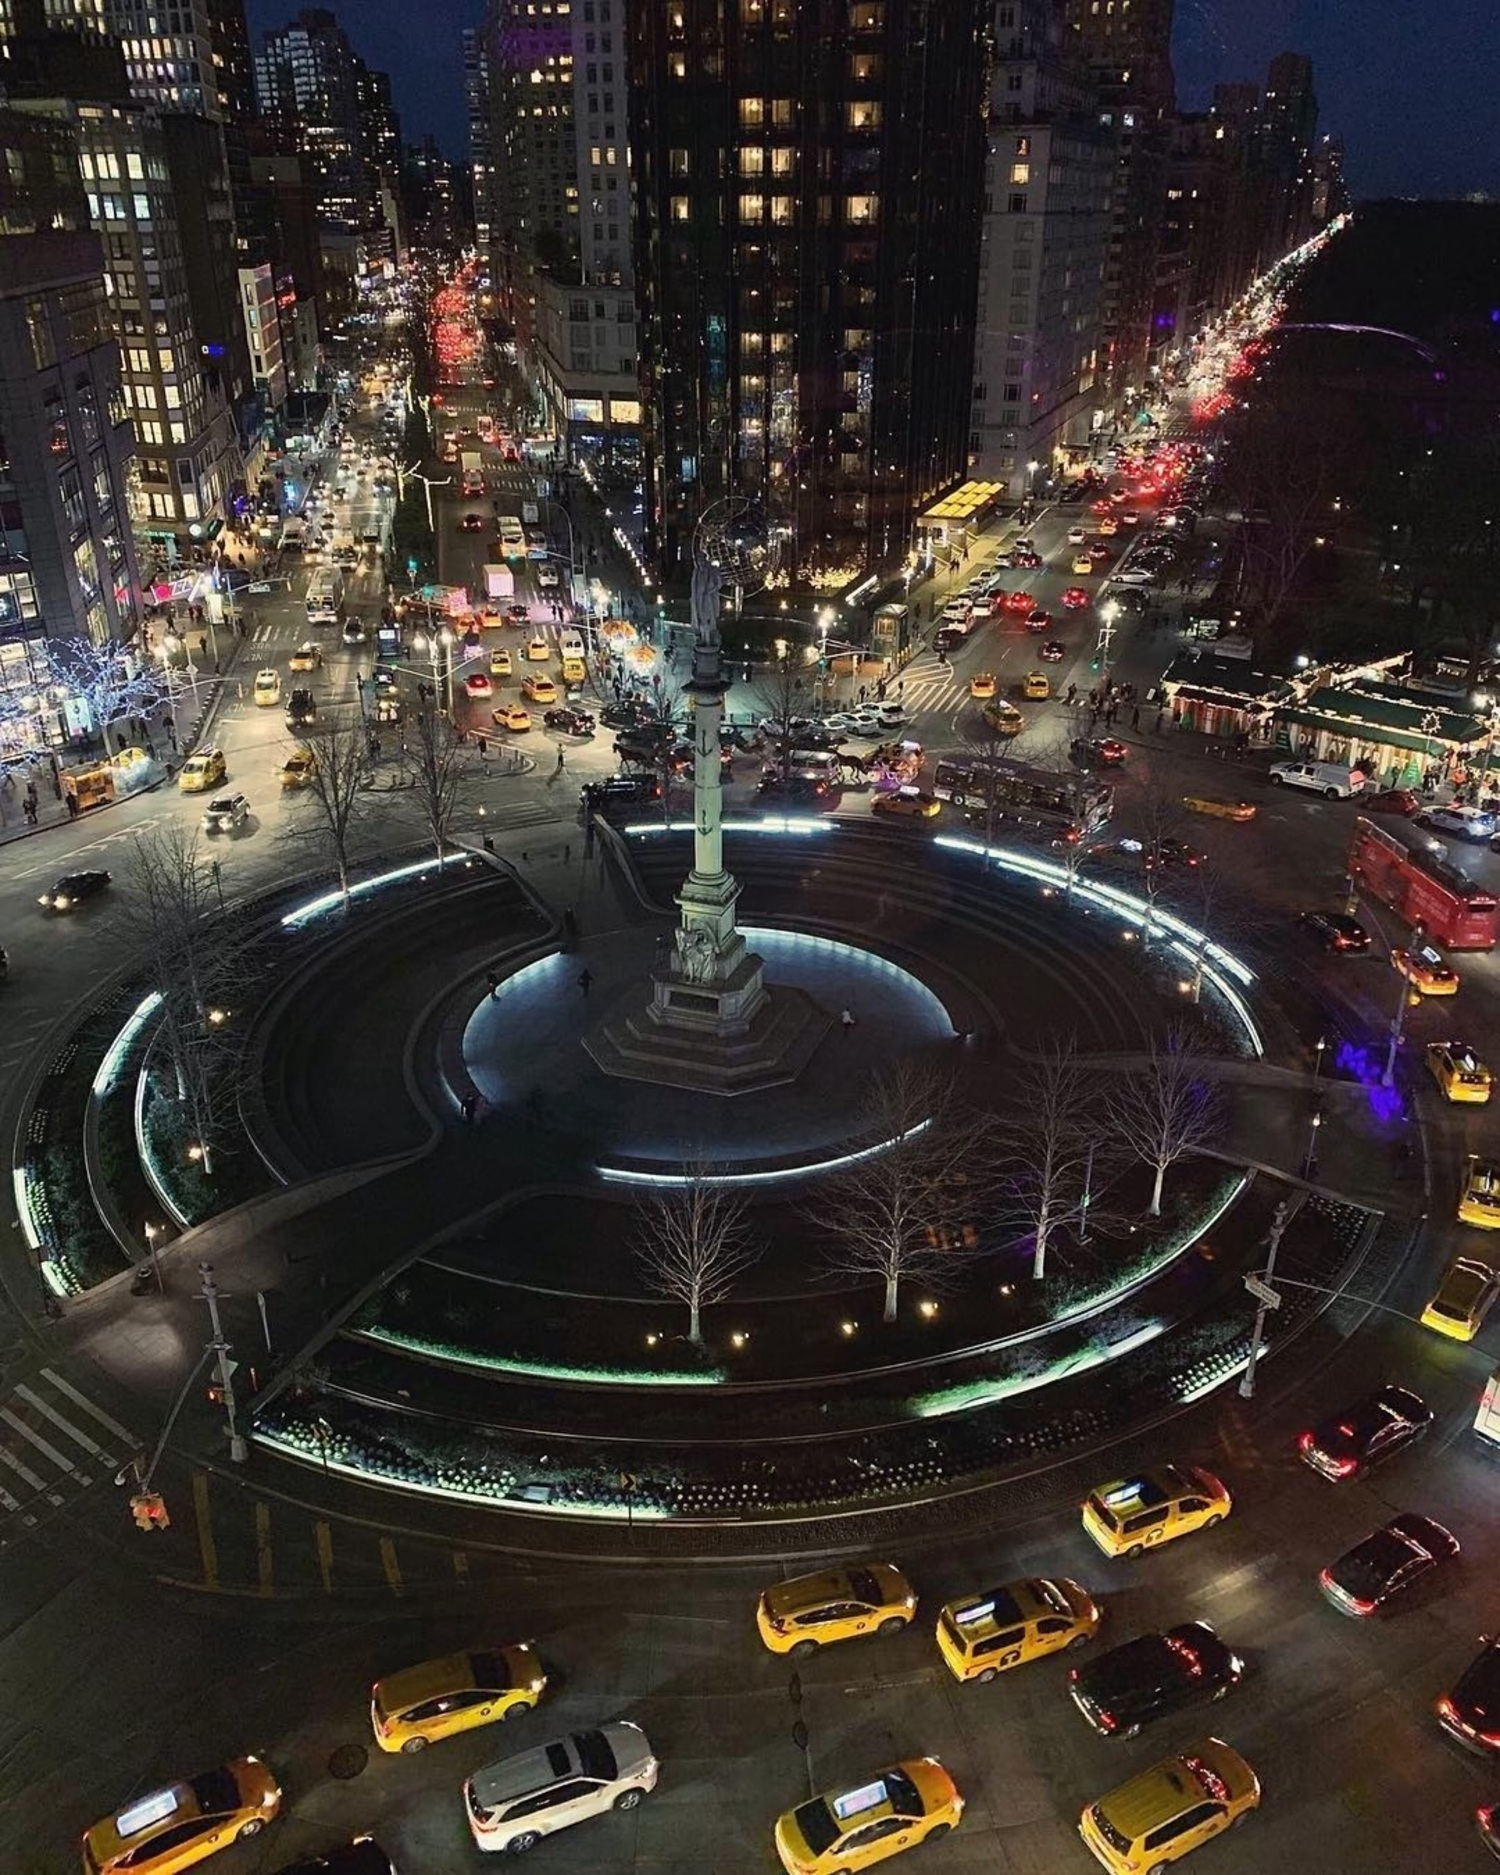 Columbus Circle, New York. Photo via @iwyndt #viewingnyc #nyc #newyork #newyorkcity